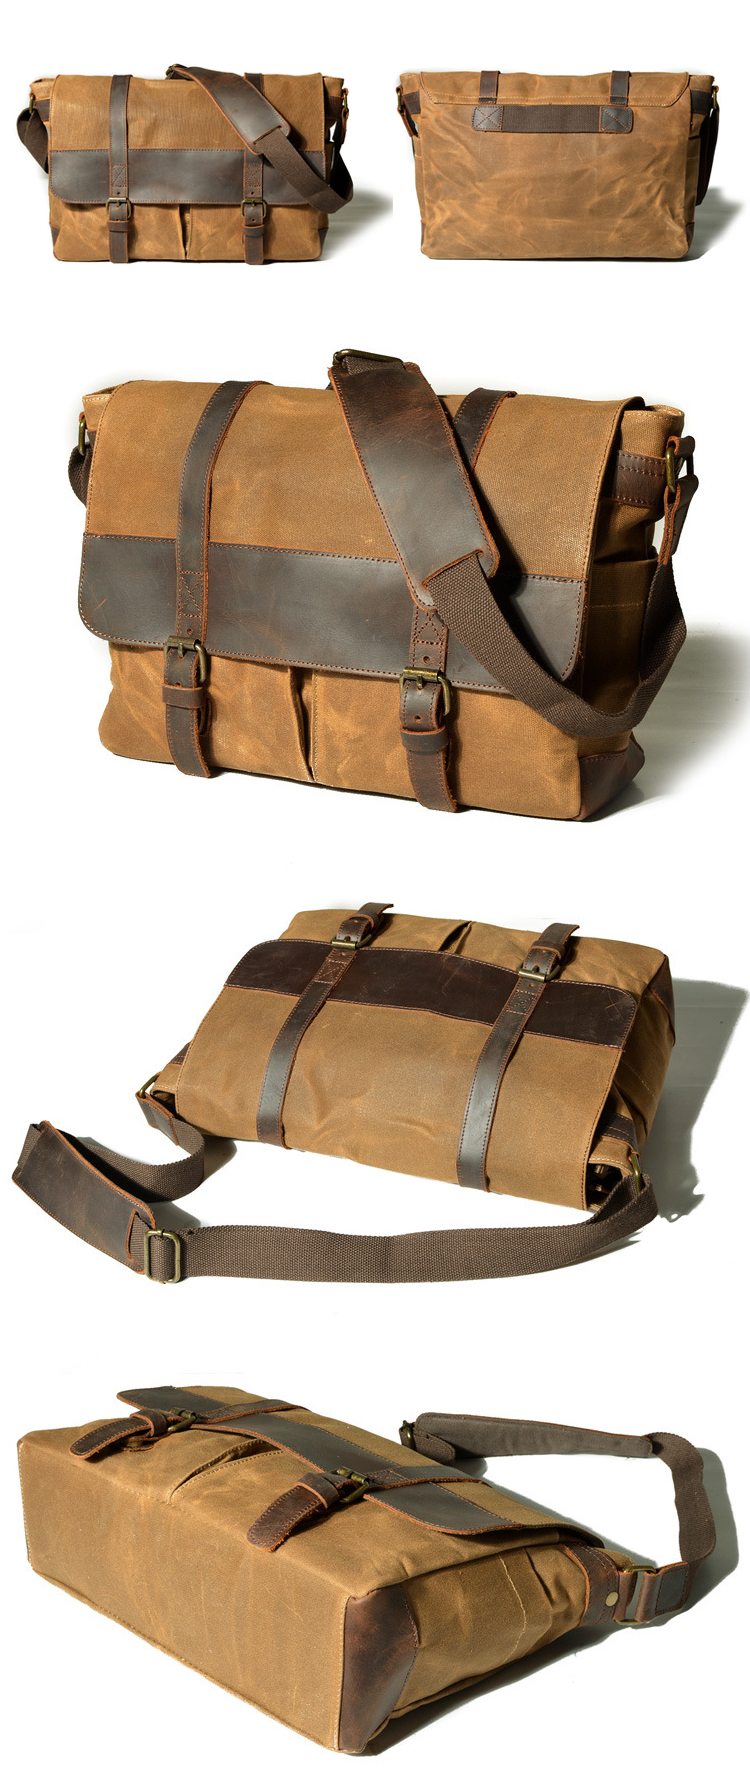 The latest popular vintage design waterproof waxed canvas unisex messenger bag briefcase digital gear camera bags